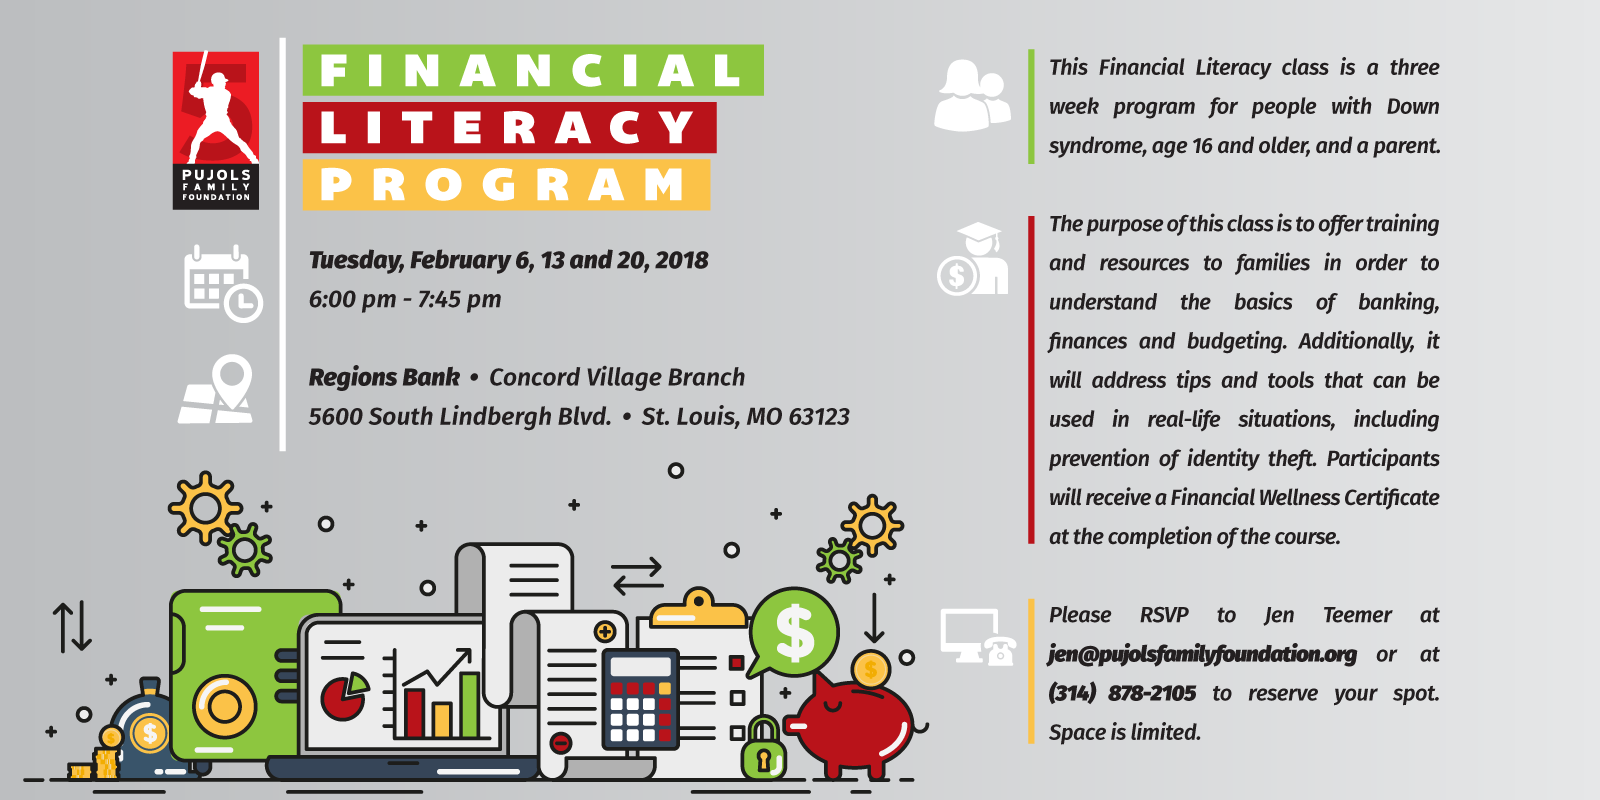 Financial Literacy Program St Louispujols Family Foundation